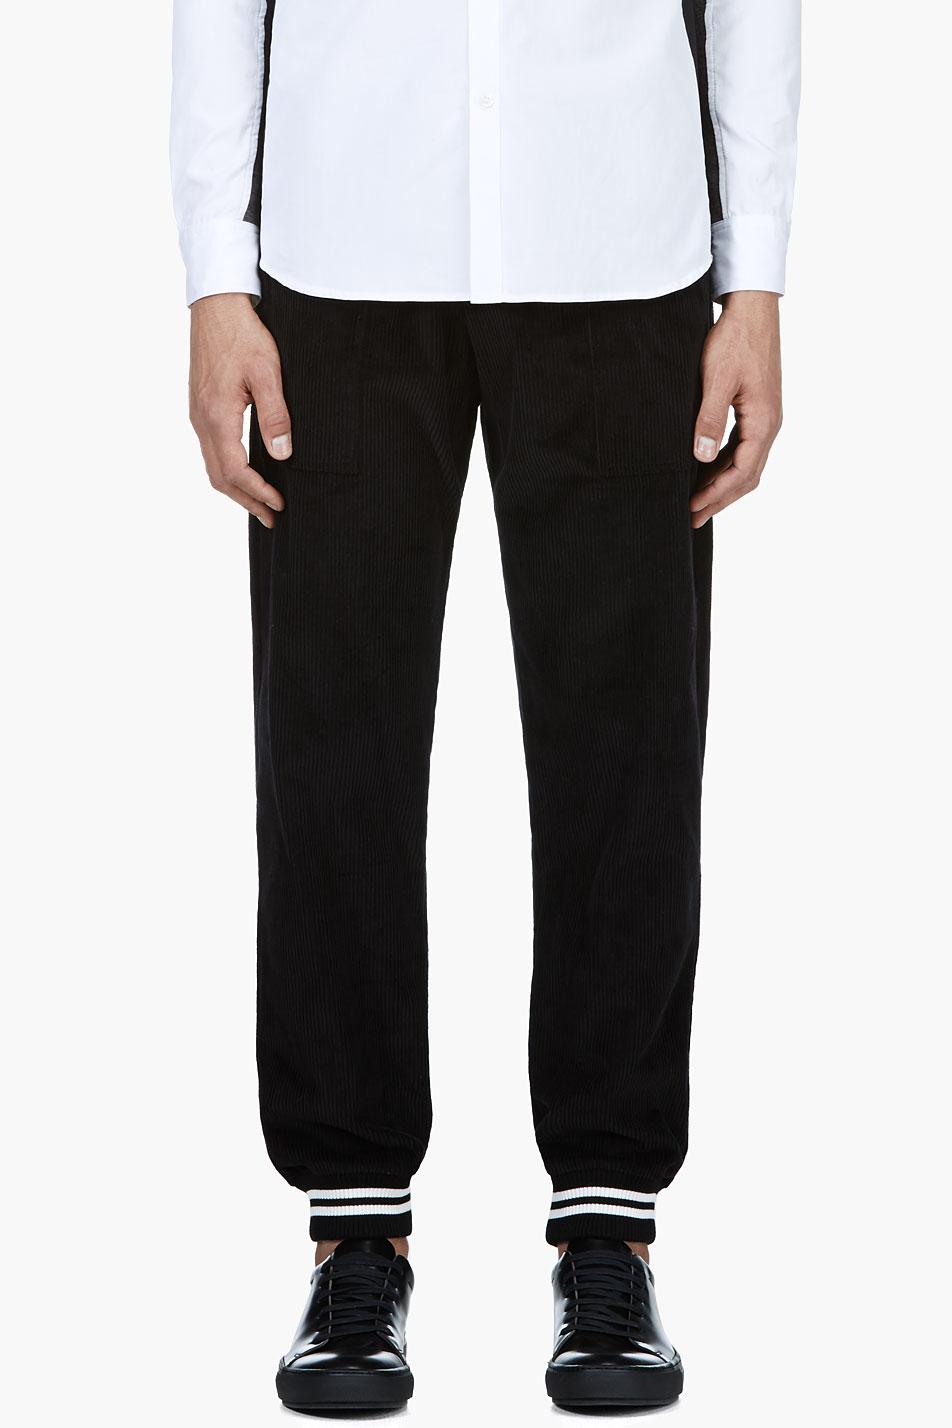 Band of outsiders black corduroy lounge pants